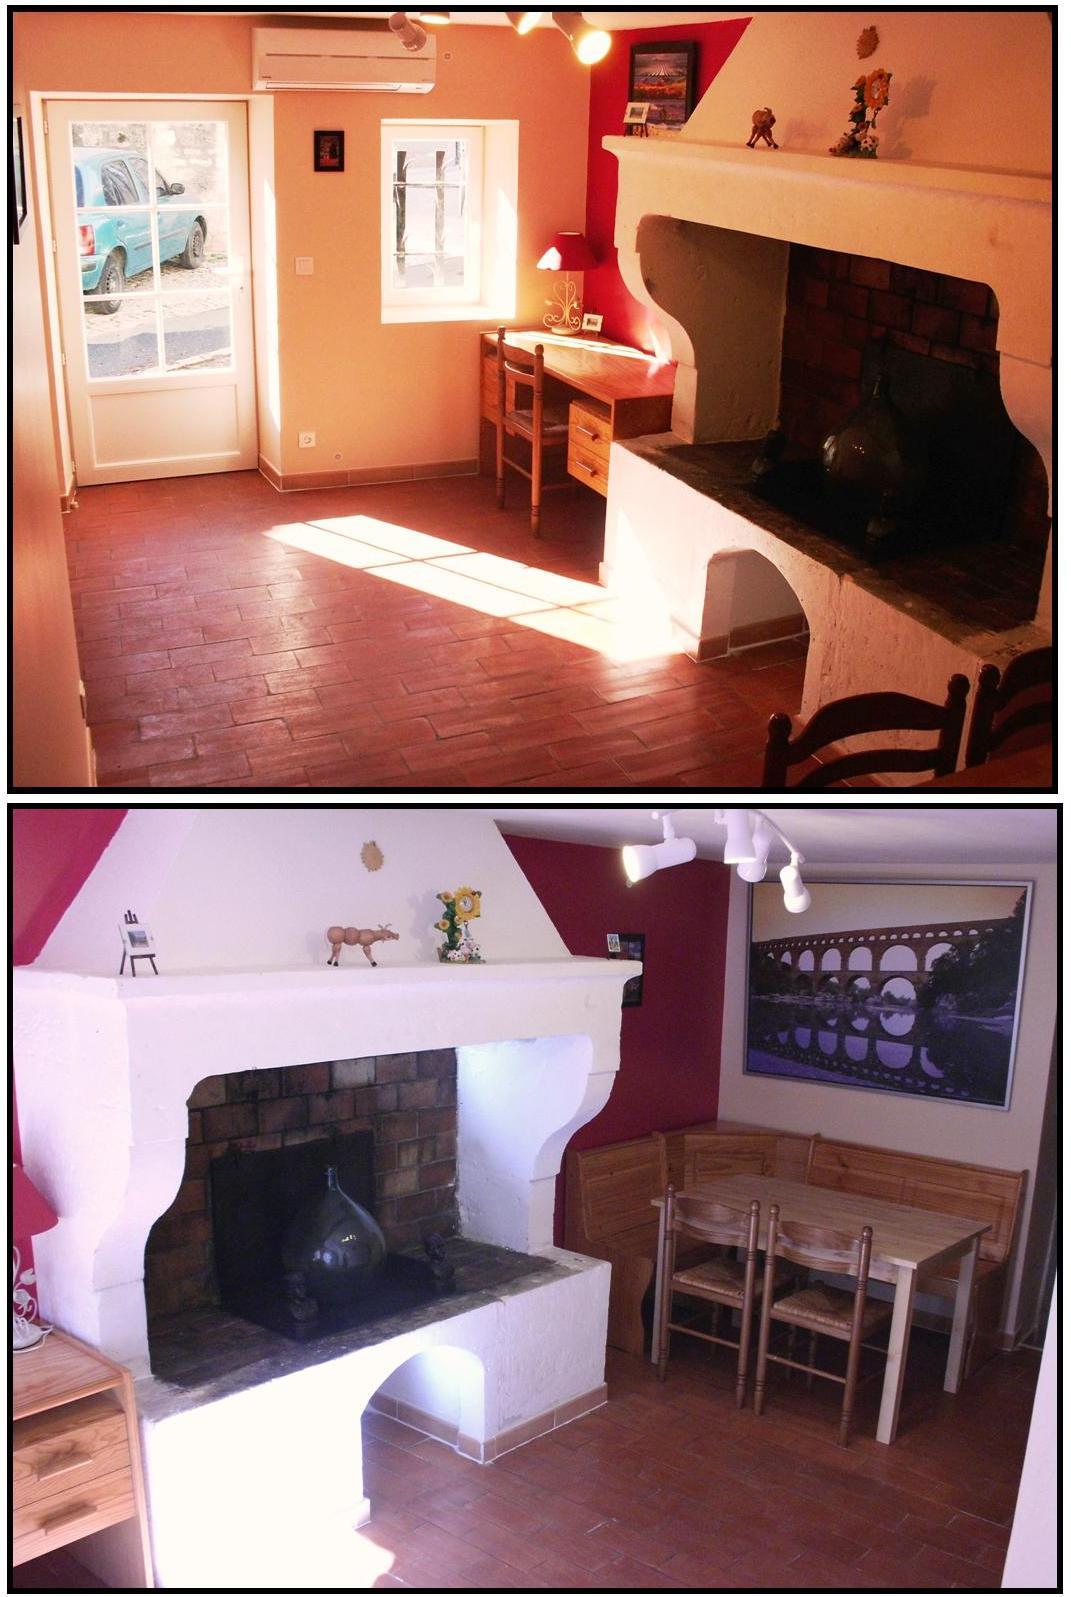 Photos maisondeprovence - Monter son salon de the ...